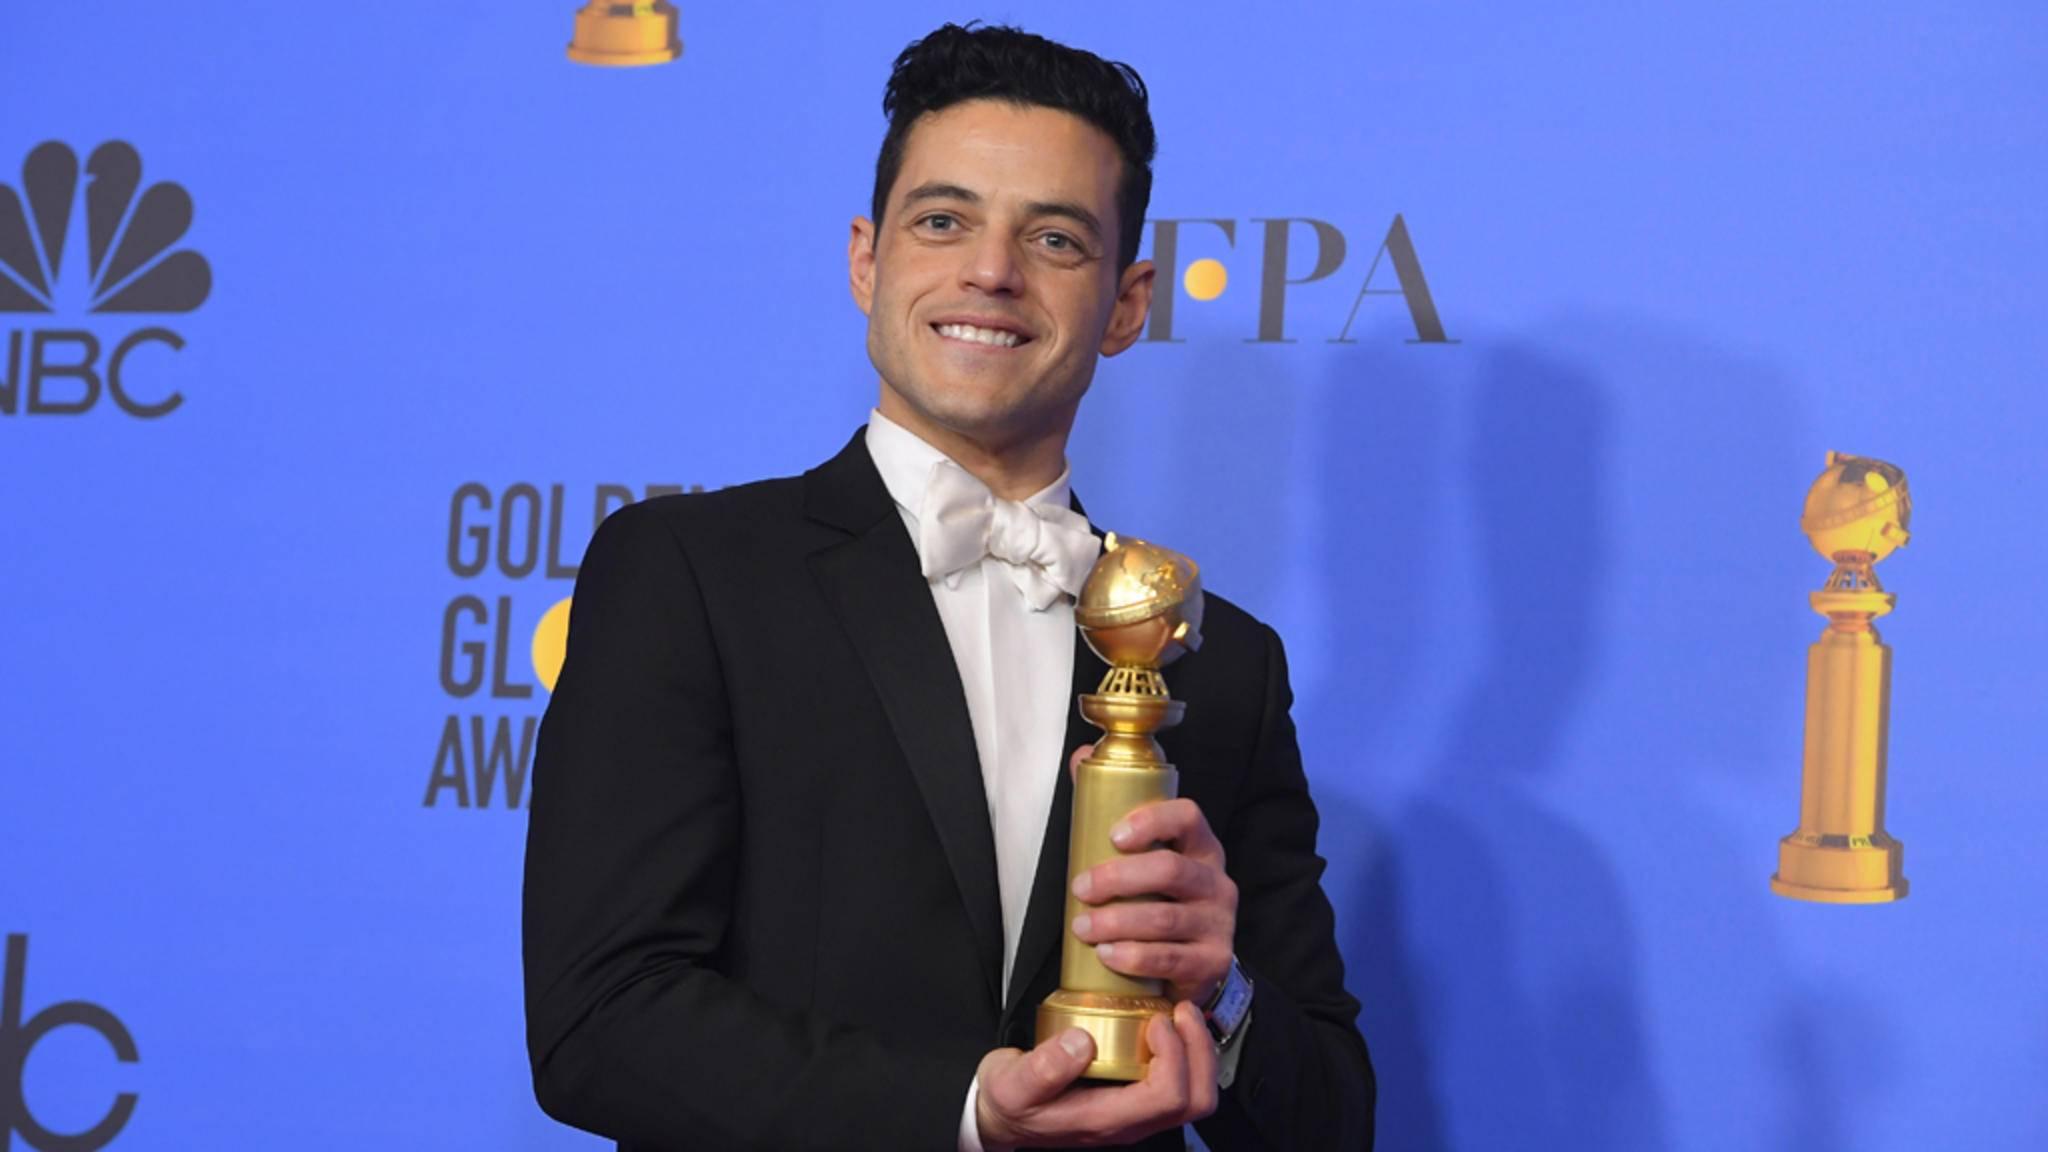 Herzlichen Glückwunsch, Rami Malek. Next Stop: Oscars 2019?